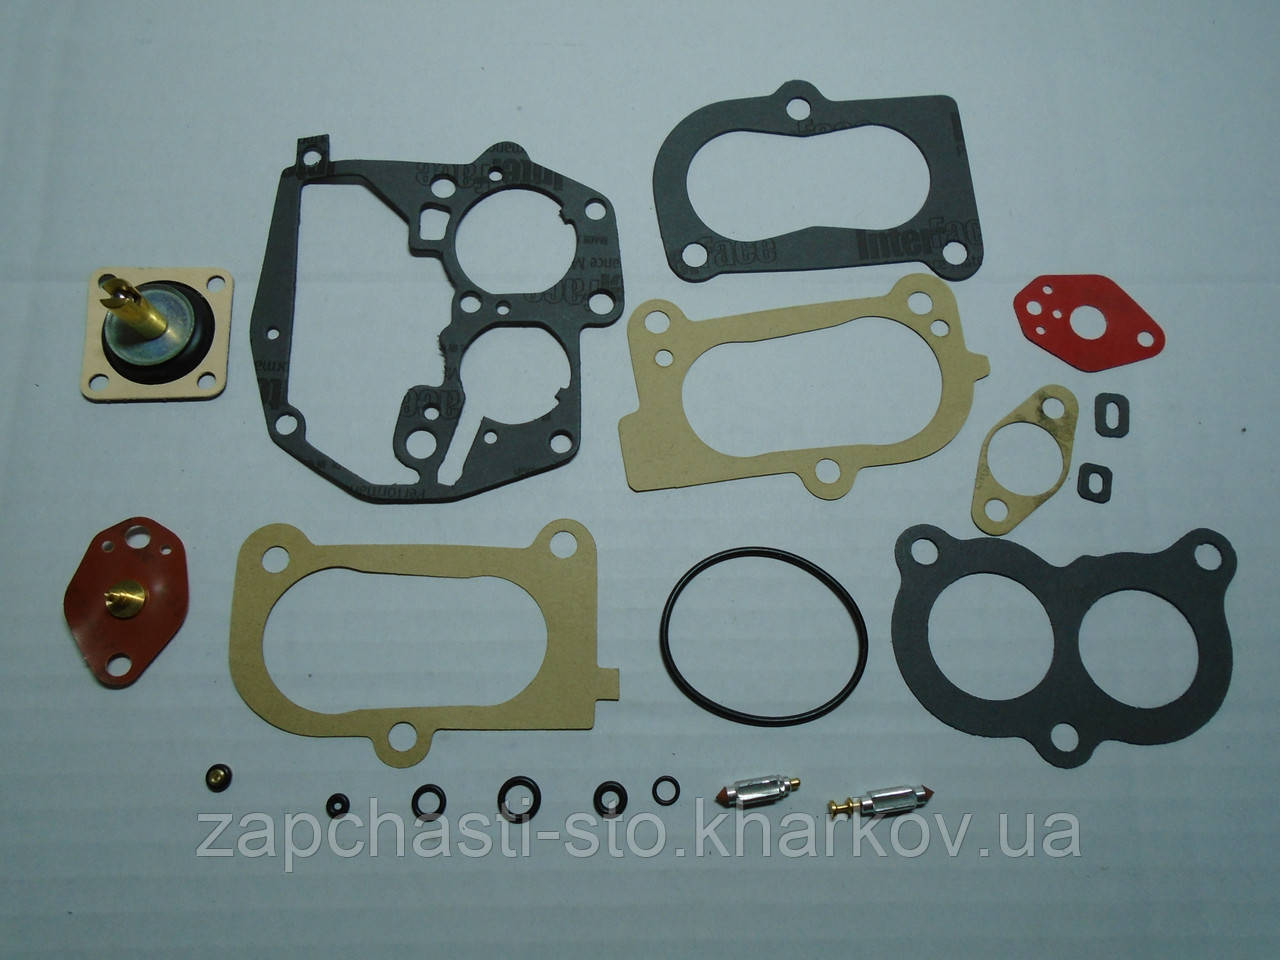 Ремкомплект карбюратора Pierburg 2E2, 2E3 Audi/Ford/Skoda/Opel/VW (Пирбург)